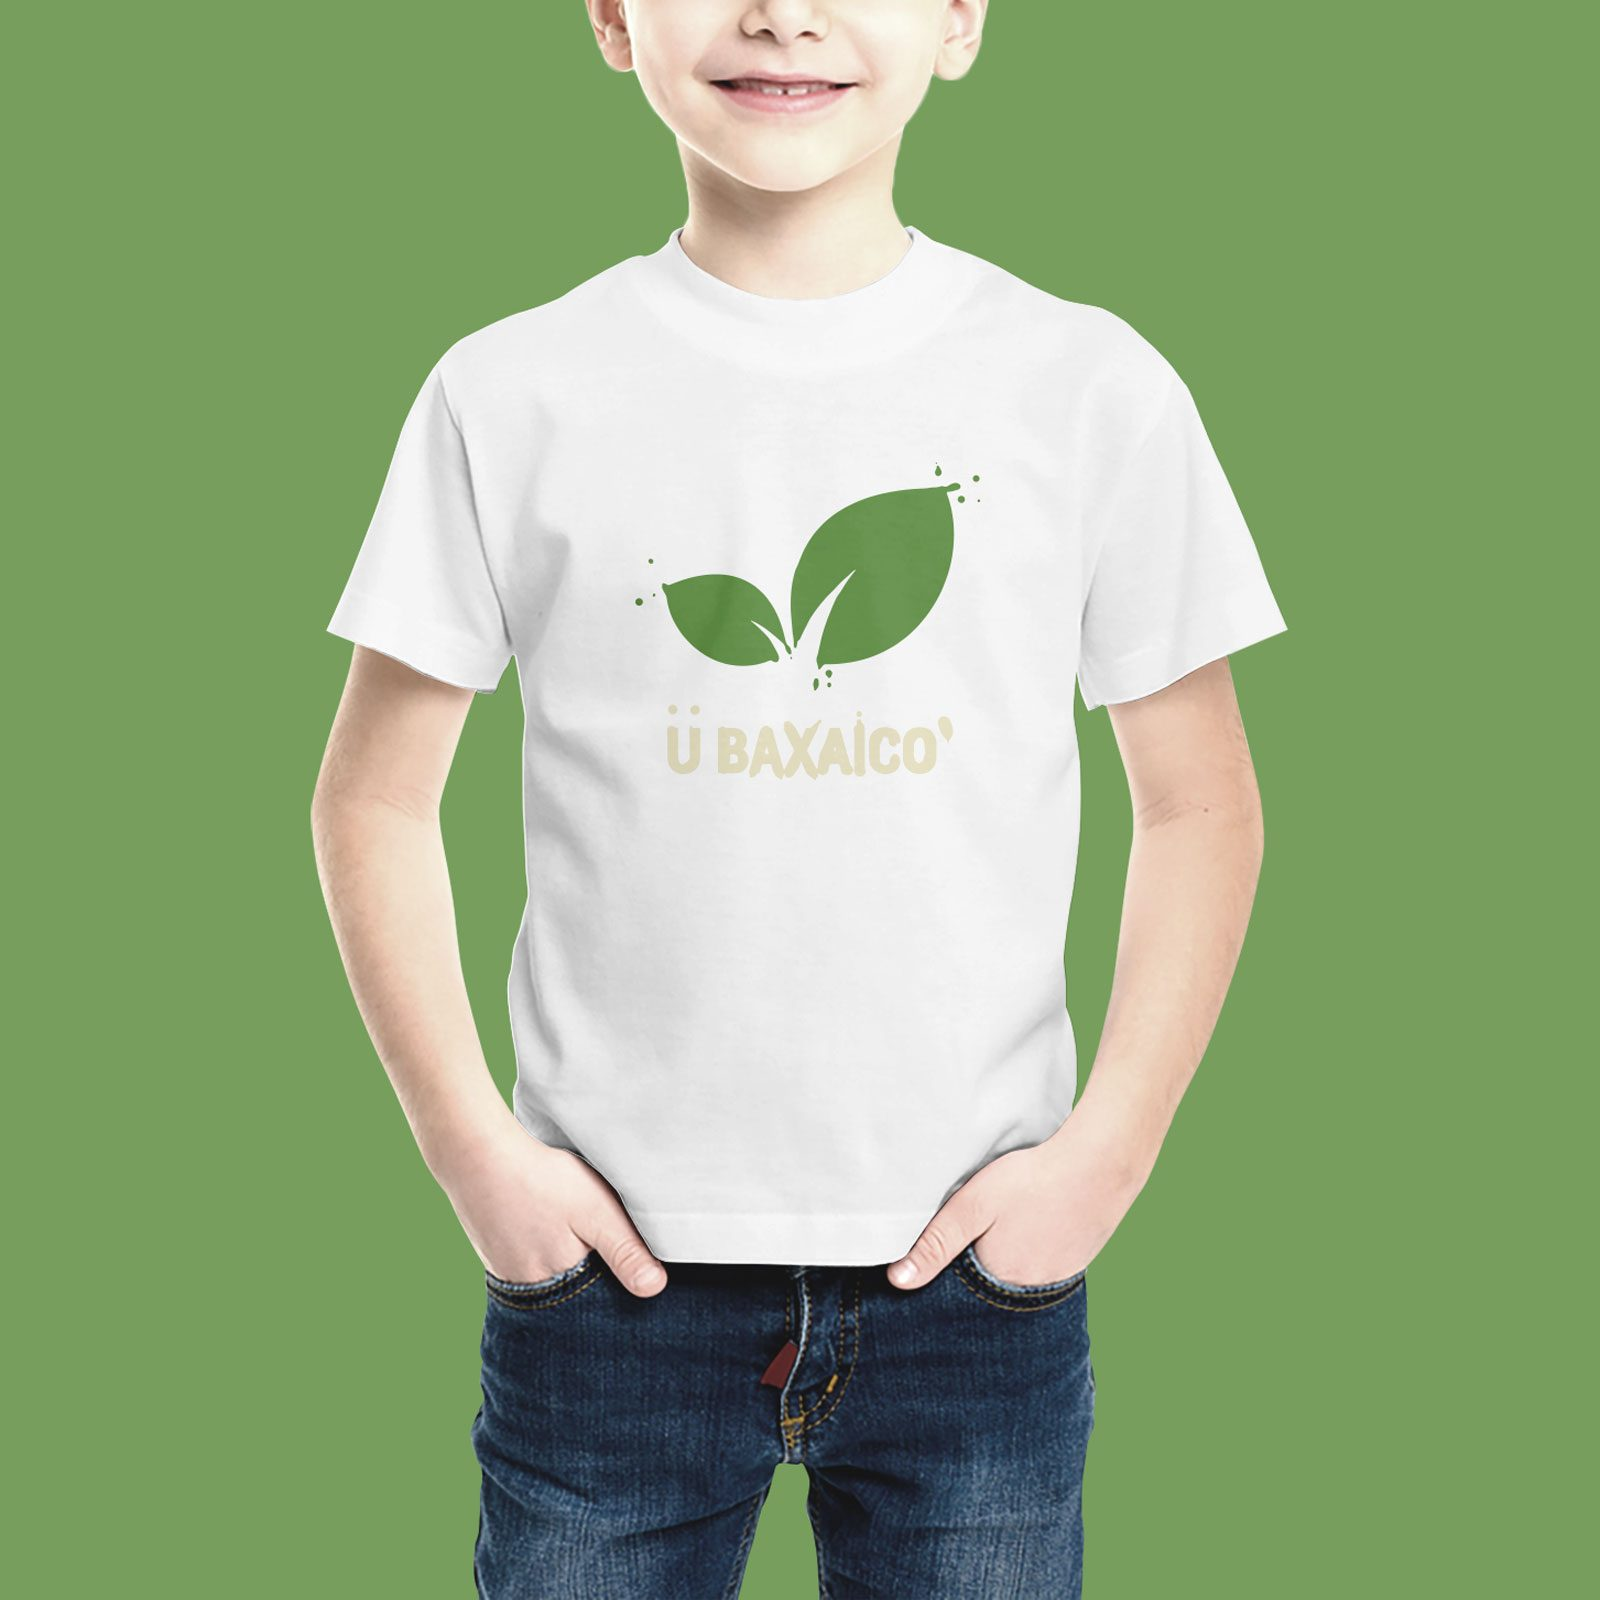 Kids T-Shirt Ü Baxaico